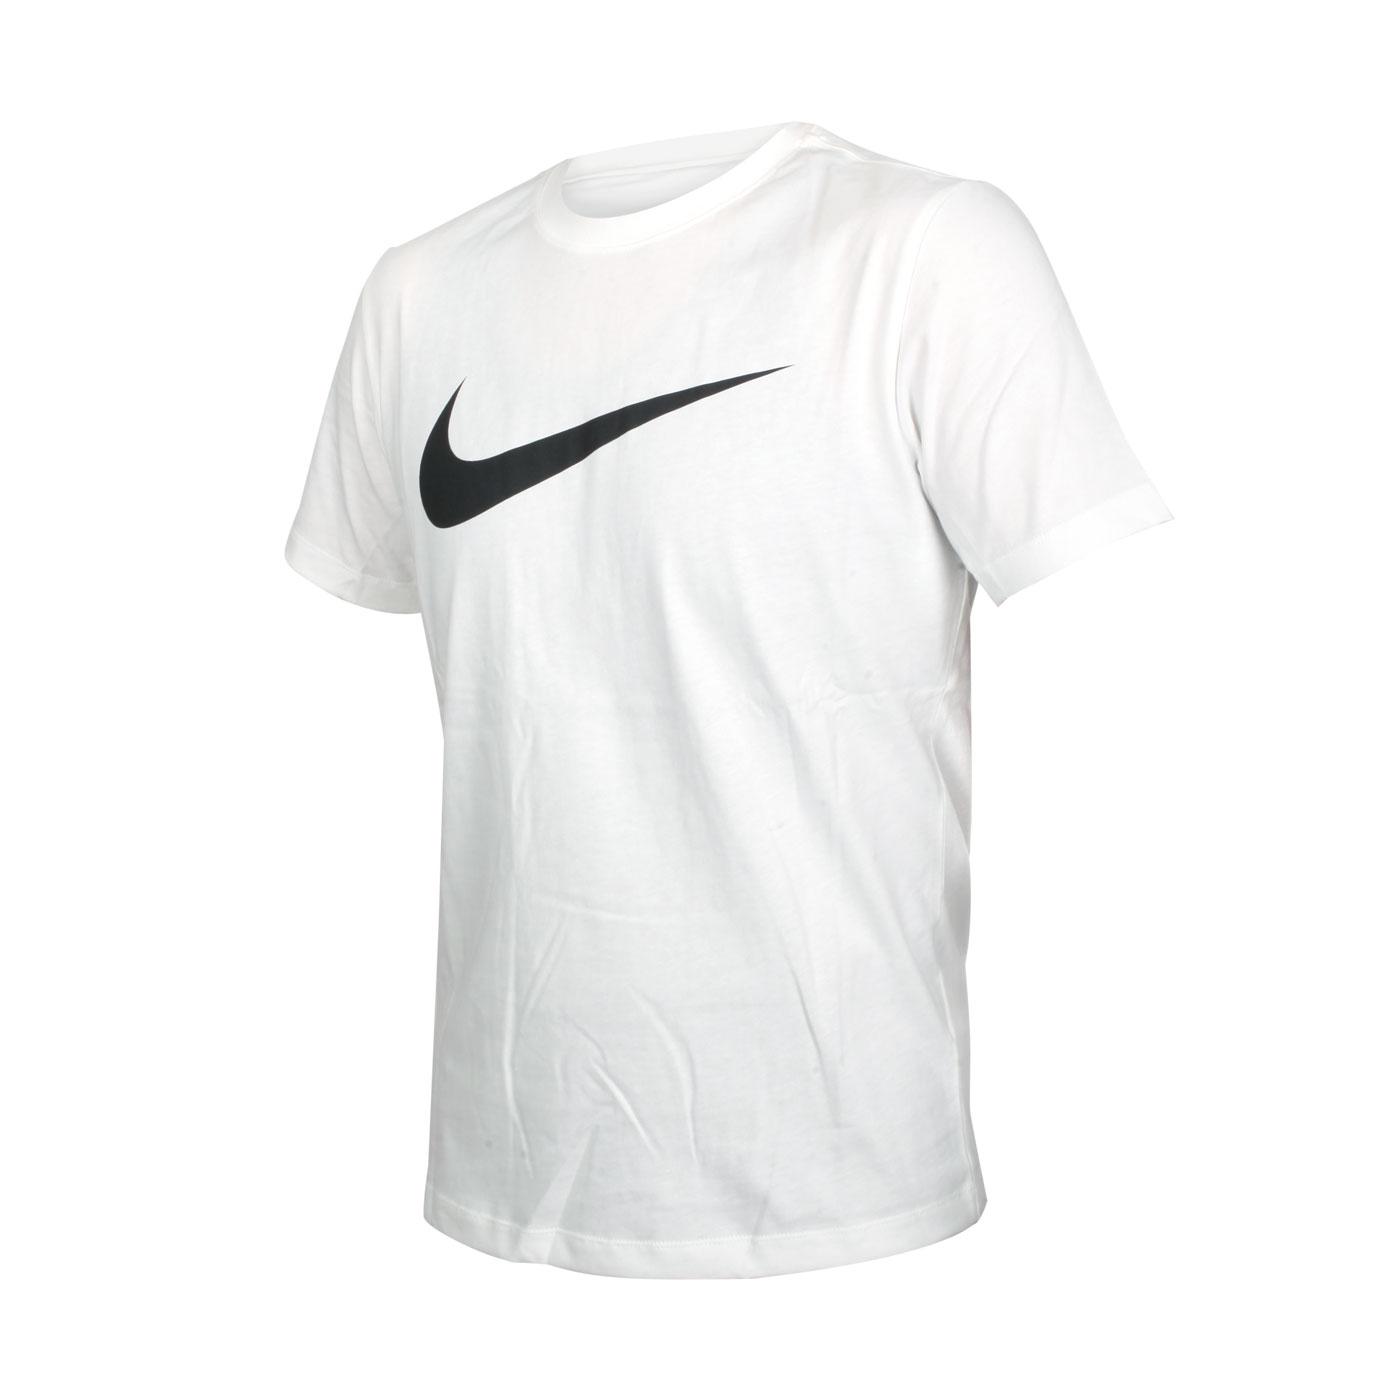 NIKE 男款短袖T恤 DC5095-100